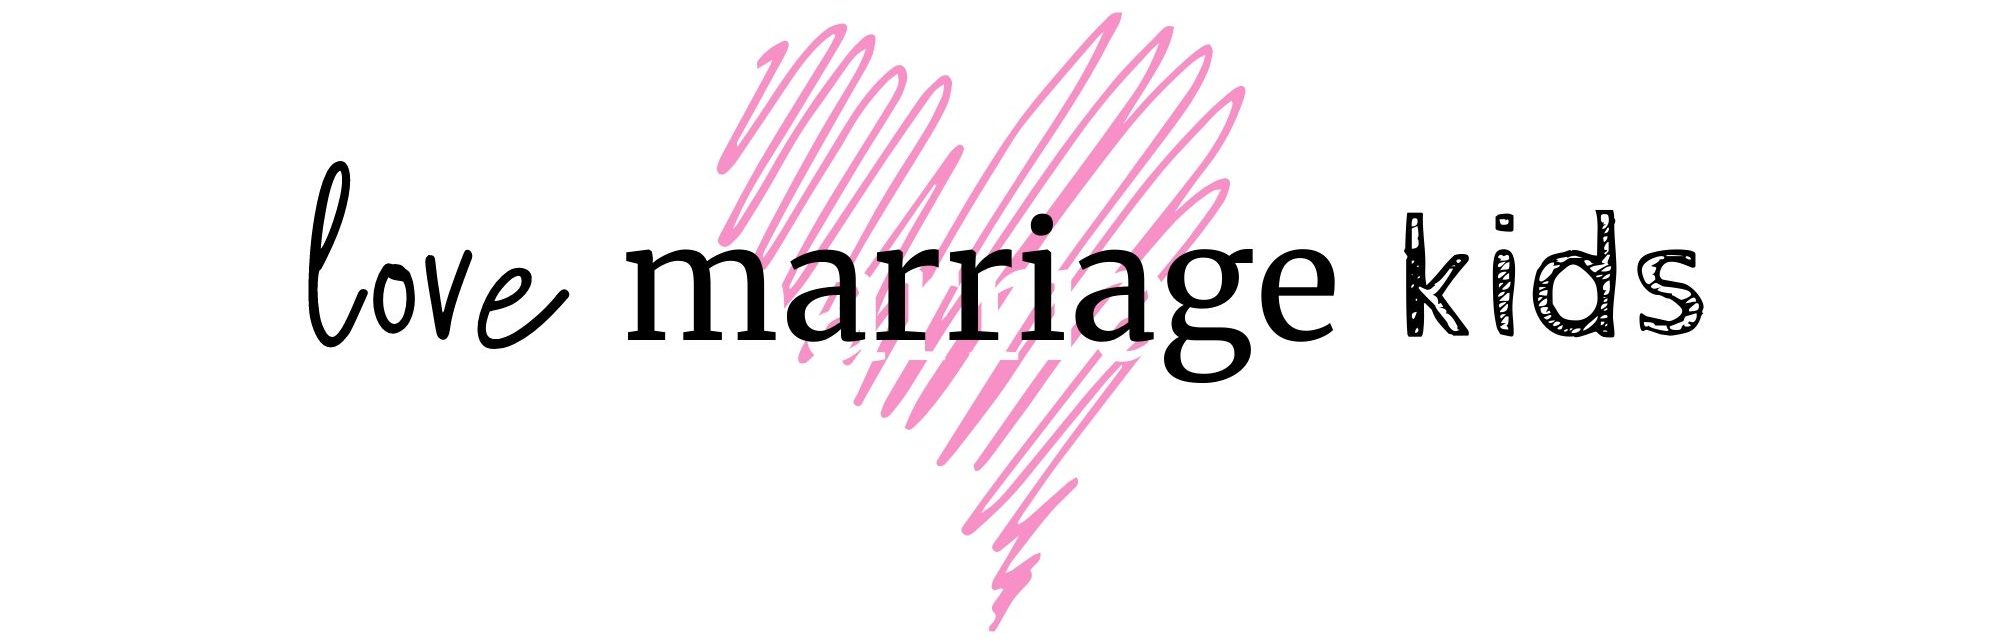 LoveMarriageKids